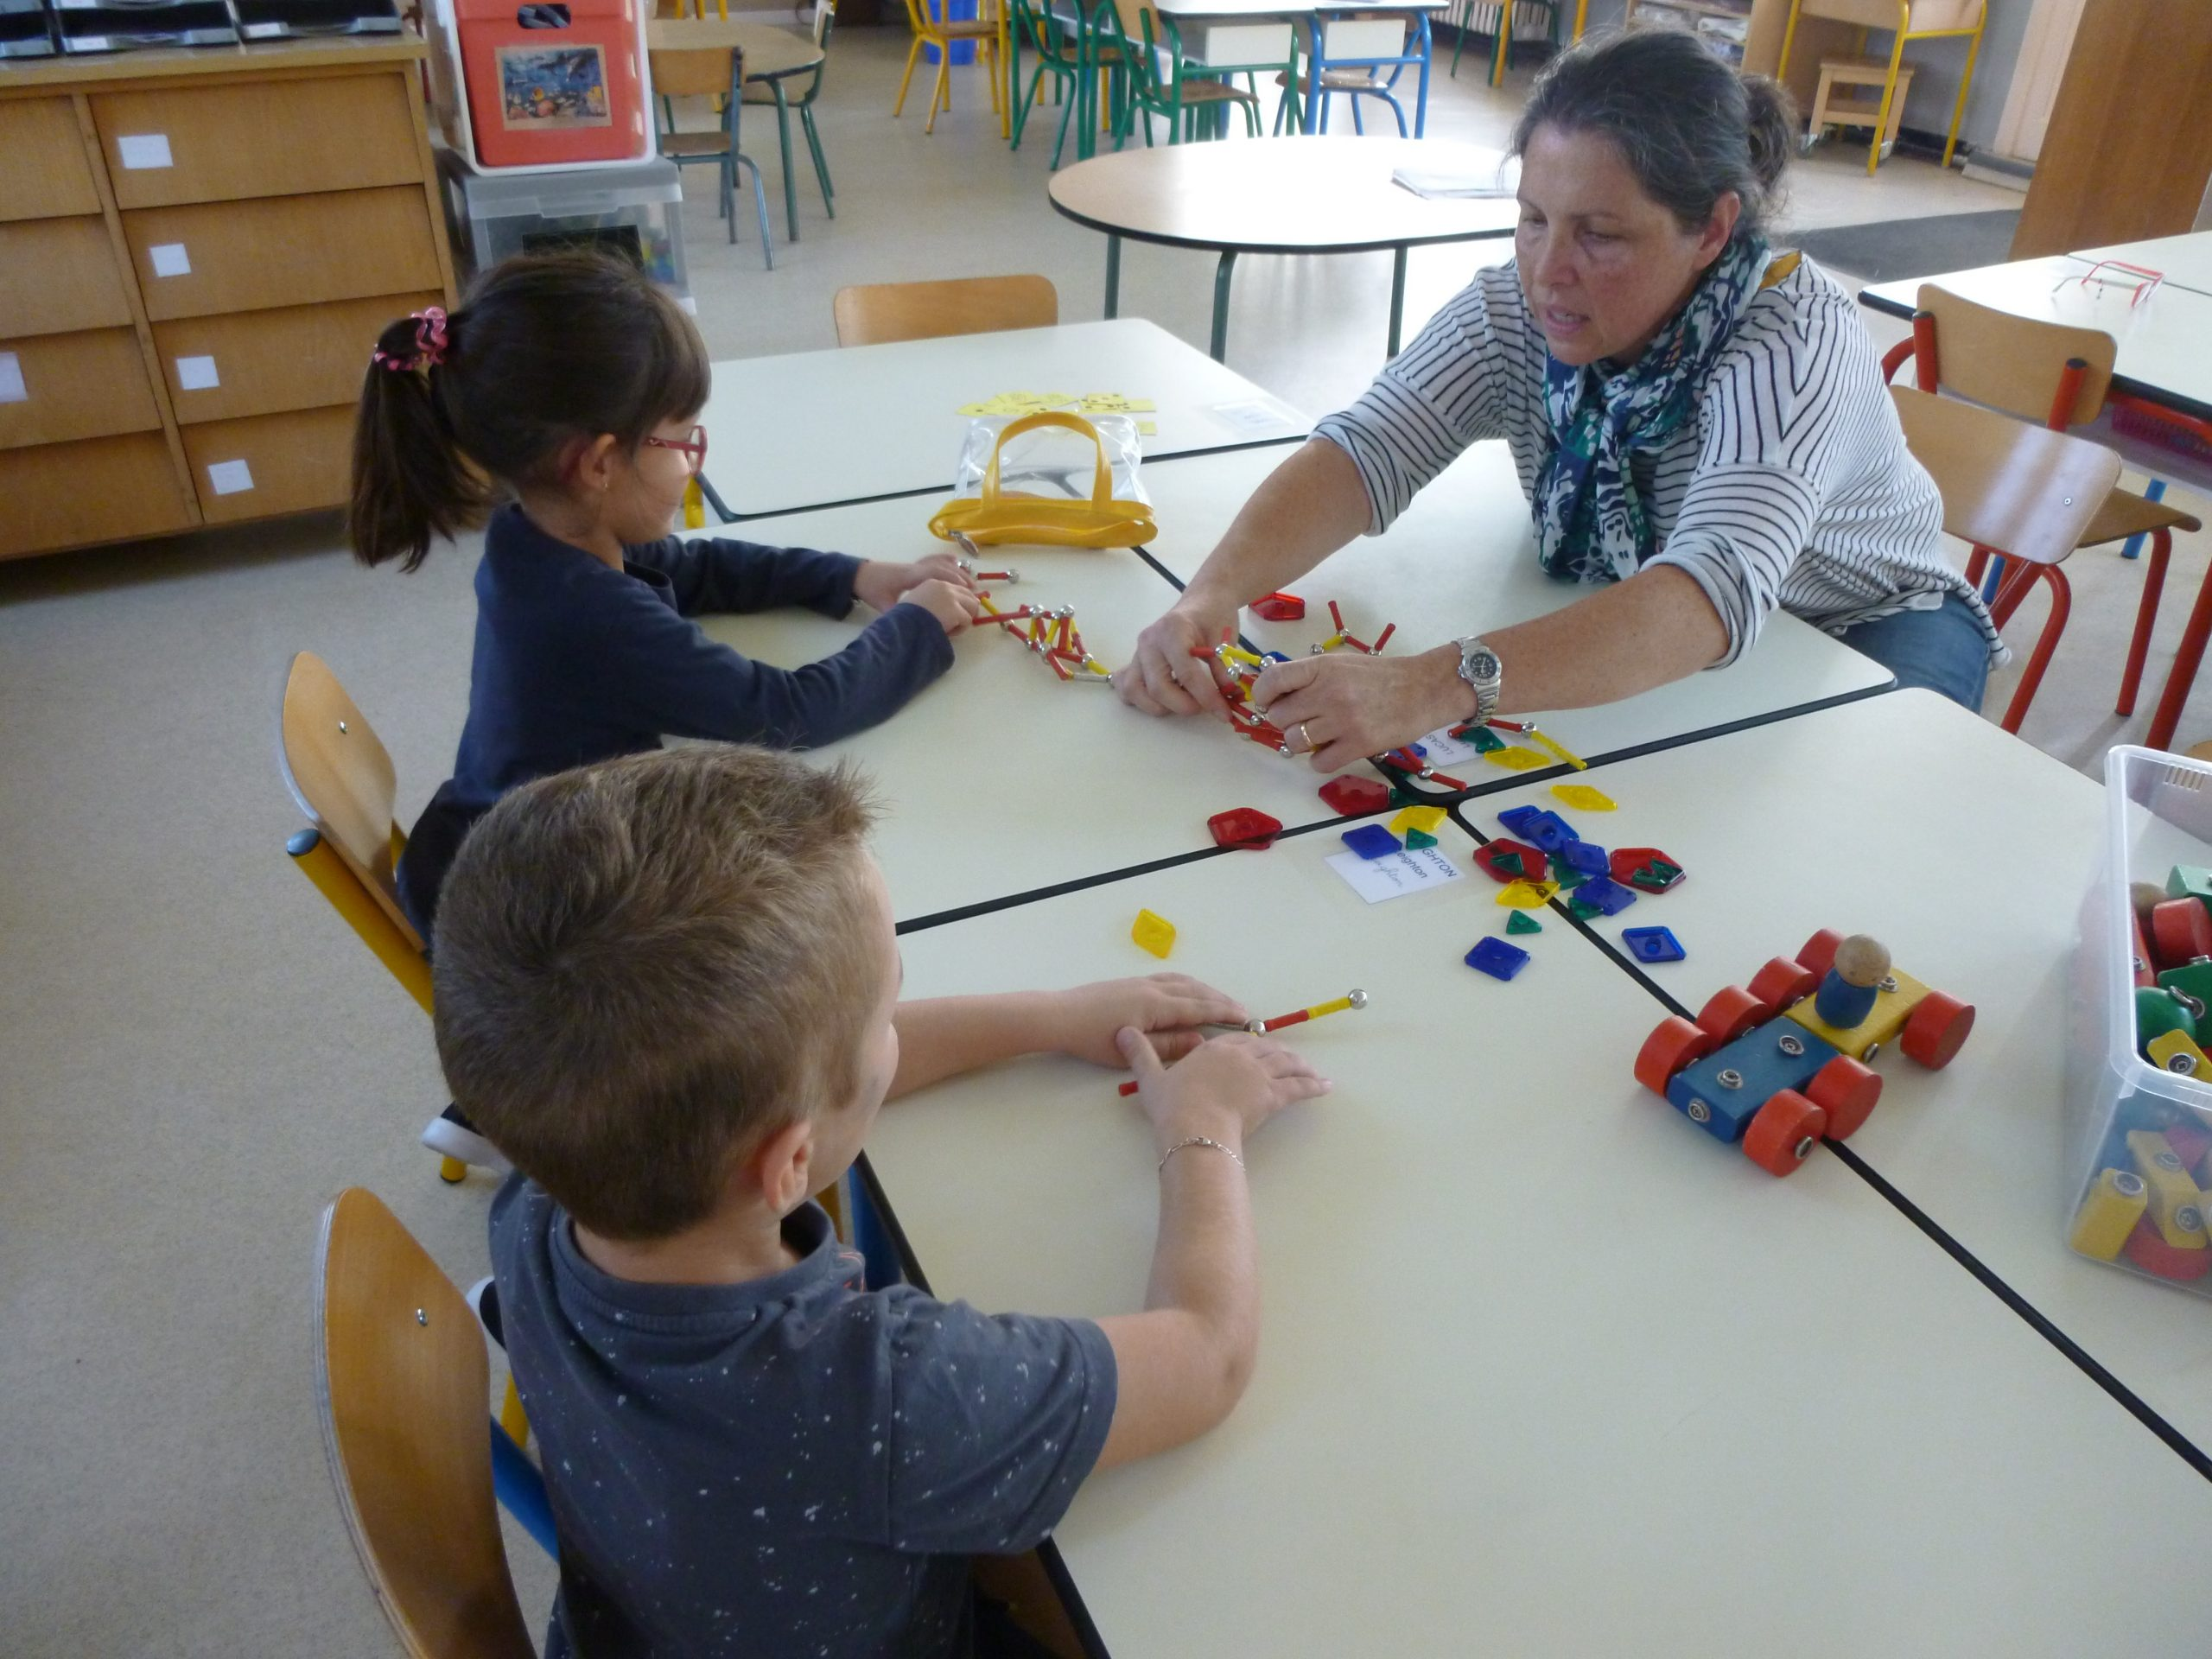 En Maternelle, L'apprentissage Des Mathématiques Se Fait De à Jeux Apprentissage Maternelle